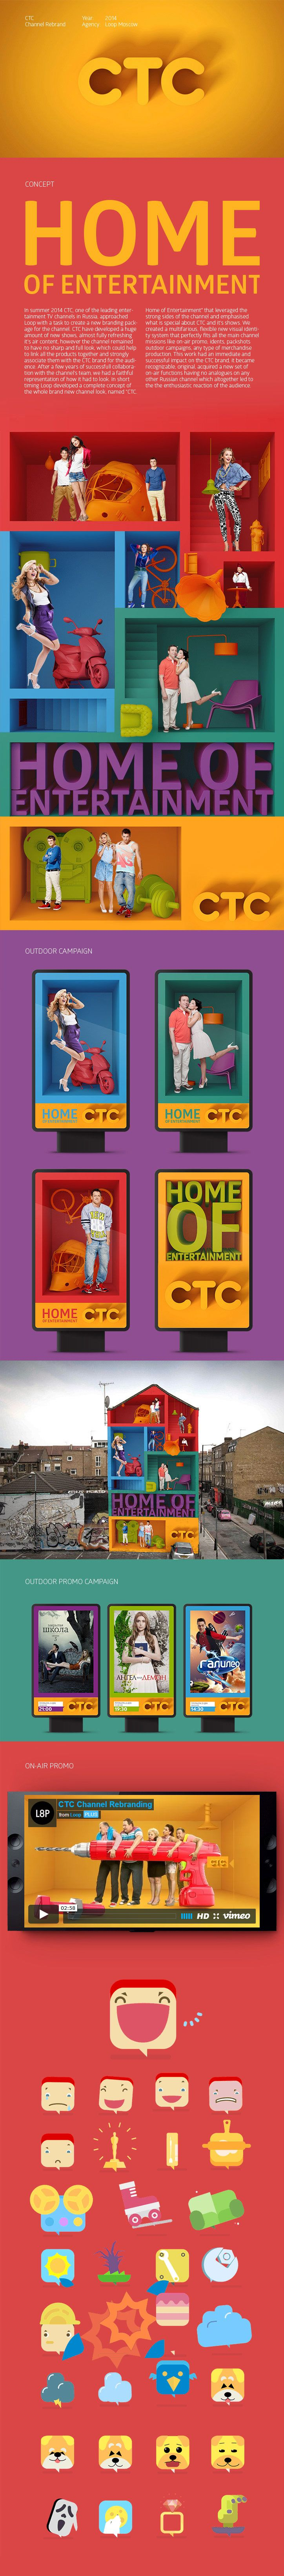 CTC频道更名品牌设计,来源自黄蜂网http://woofeng.cn/